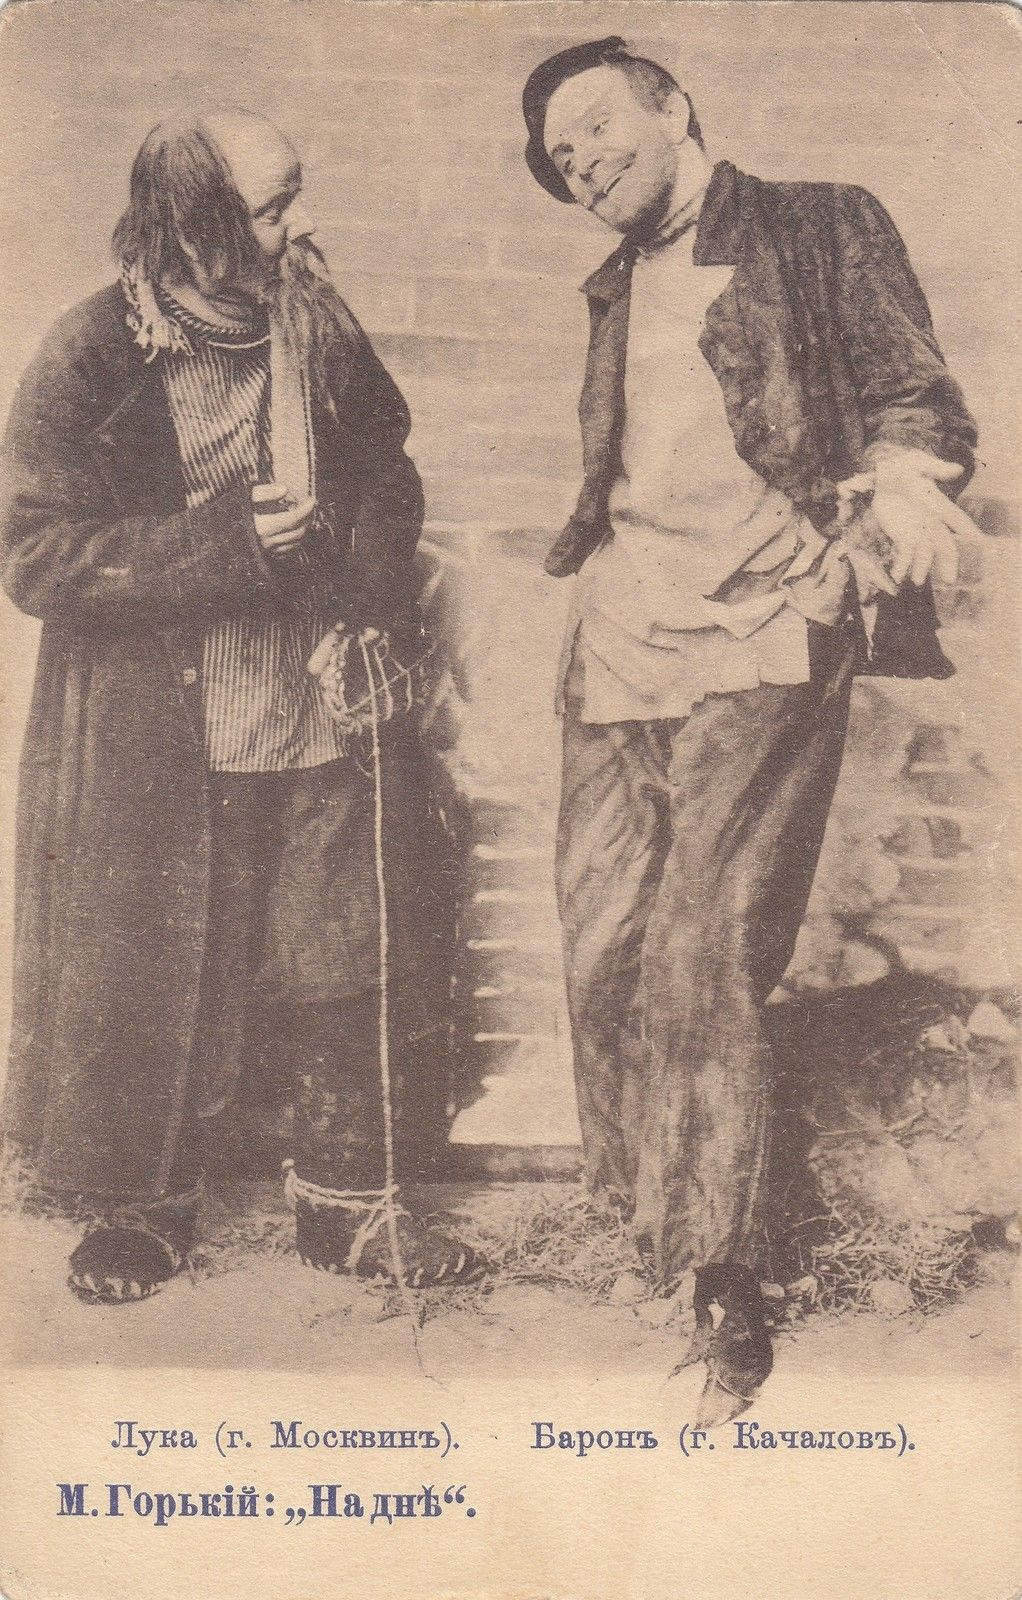 Барон (Качалов), Лука (Москвин)